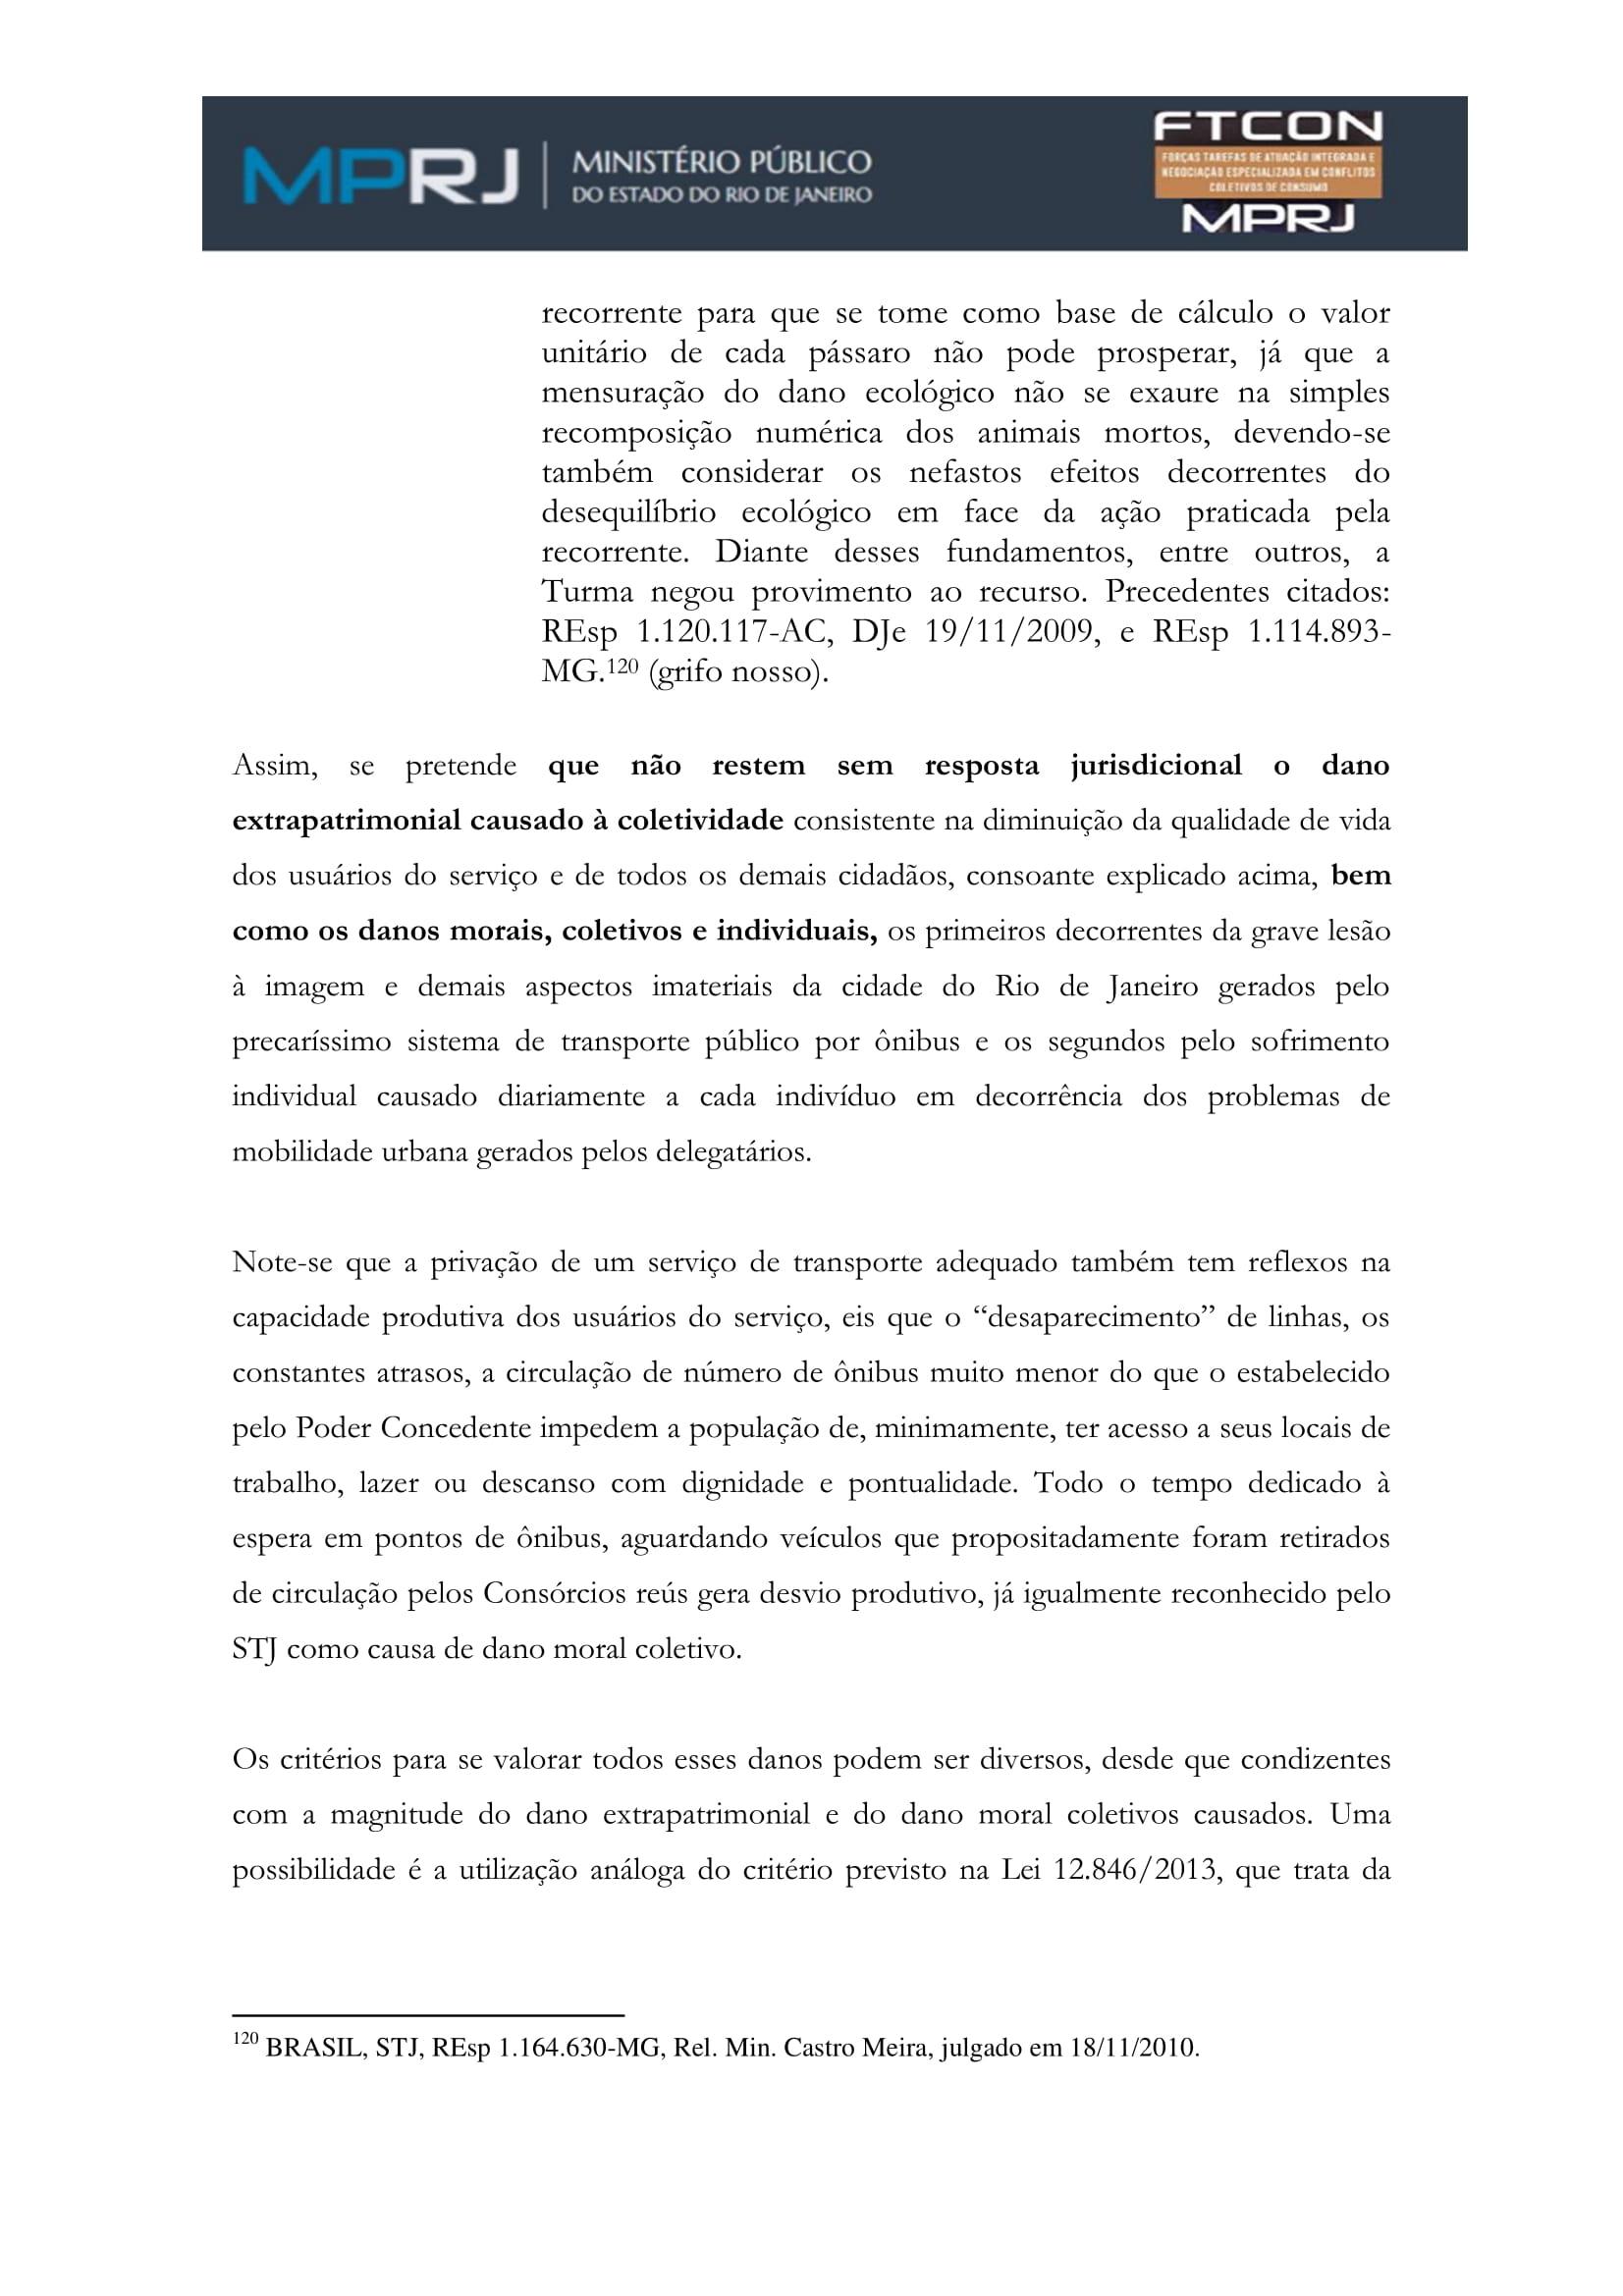 acp_caducidade_onibus_dr_rt-132